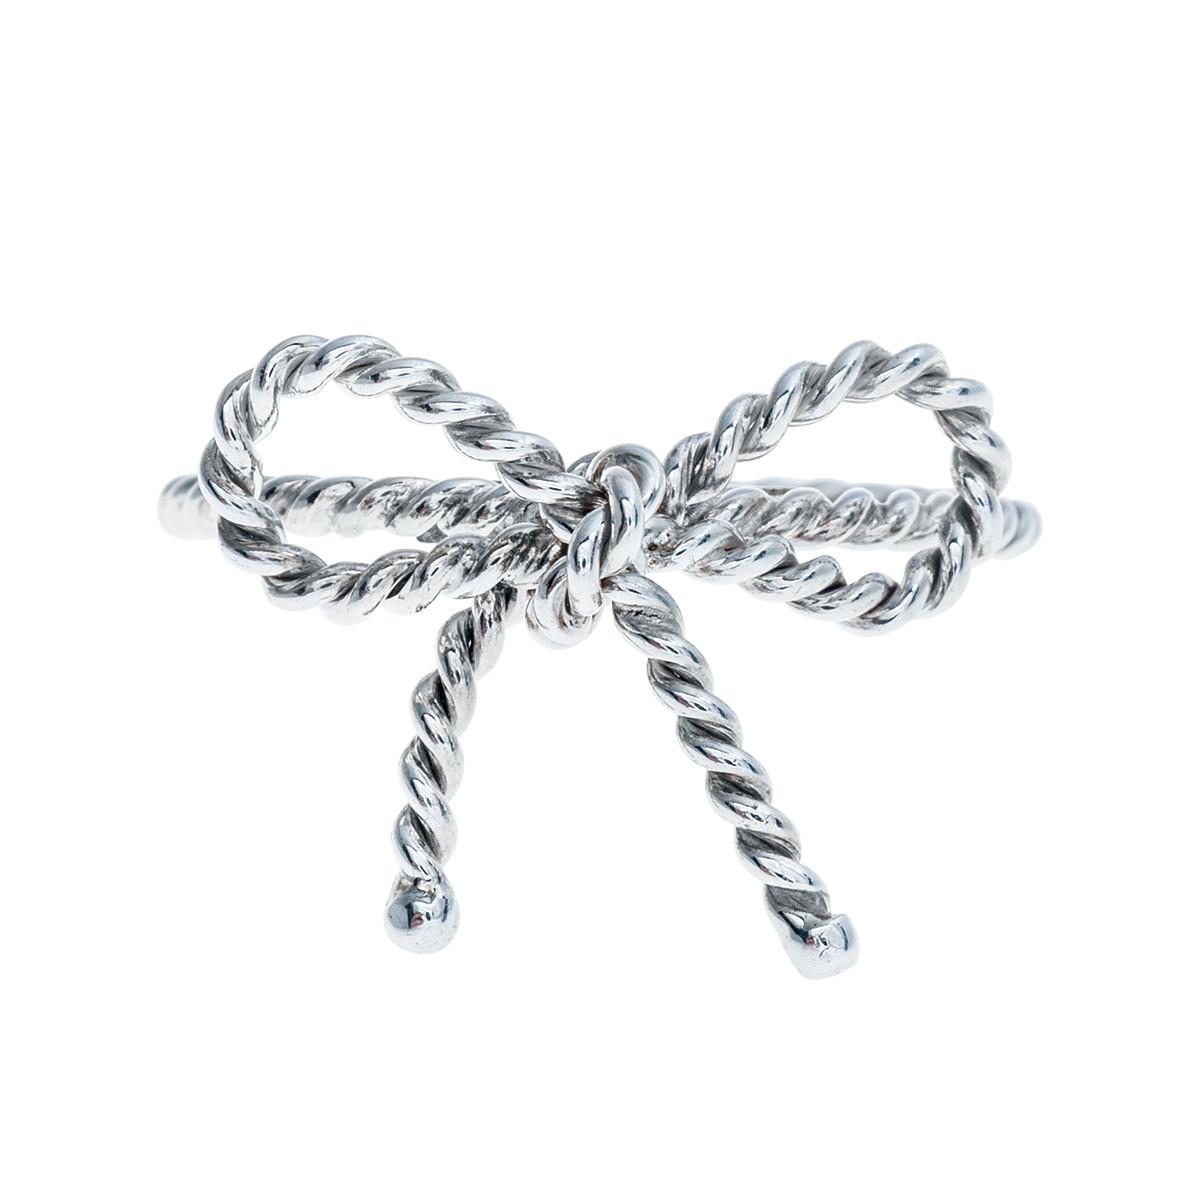 Vintage Tiffany & Co. Twist Bow Ring